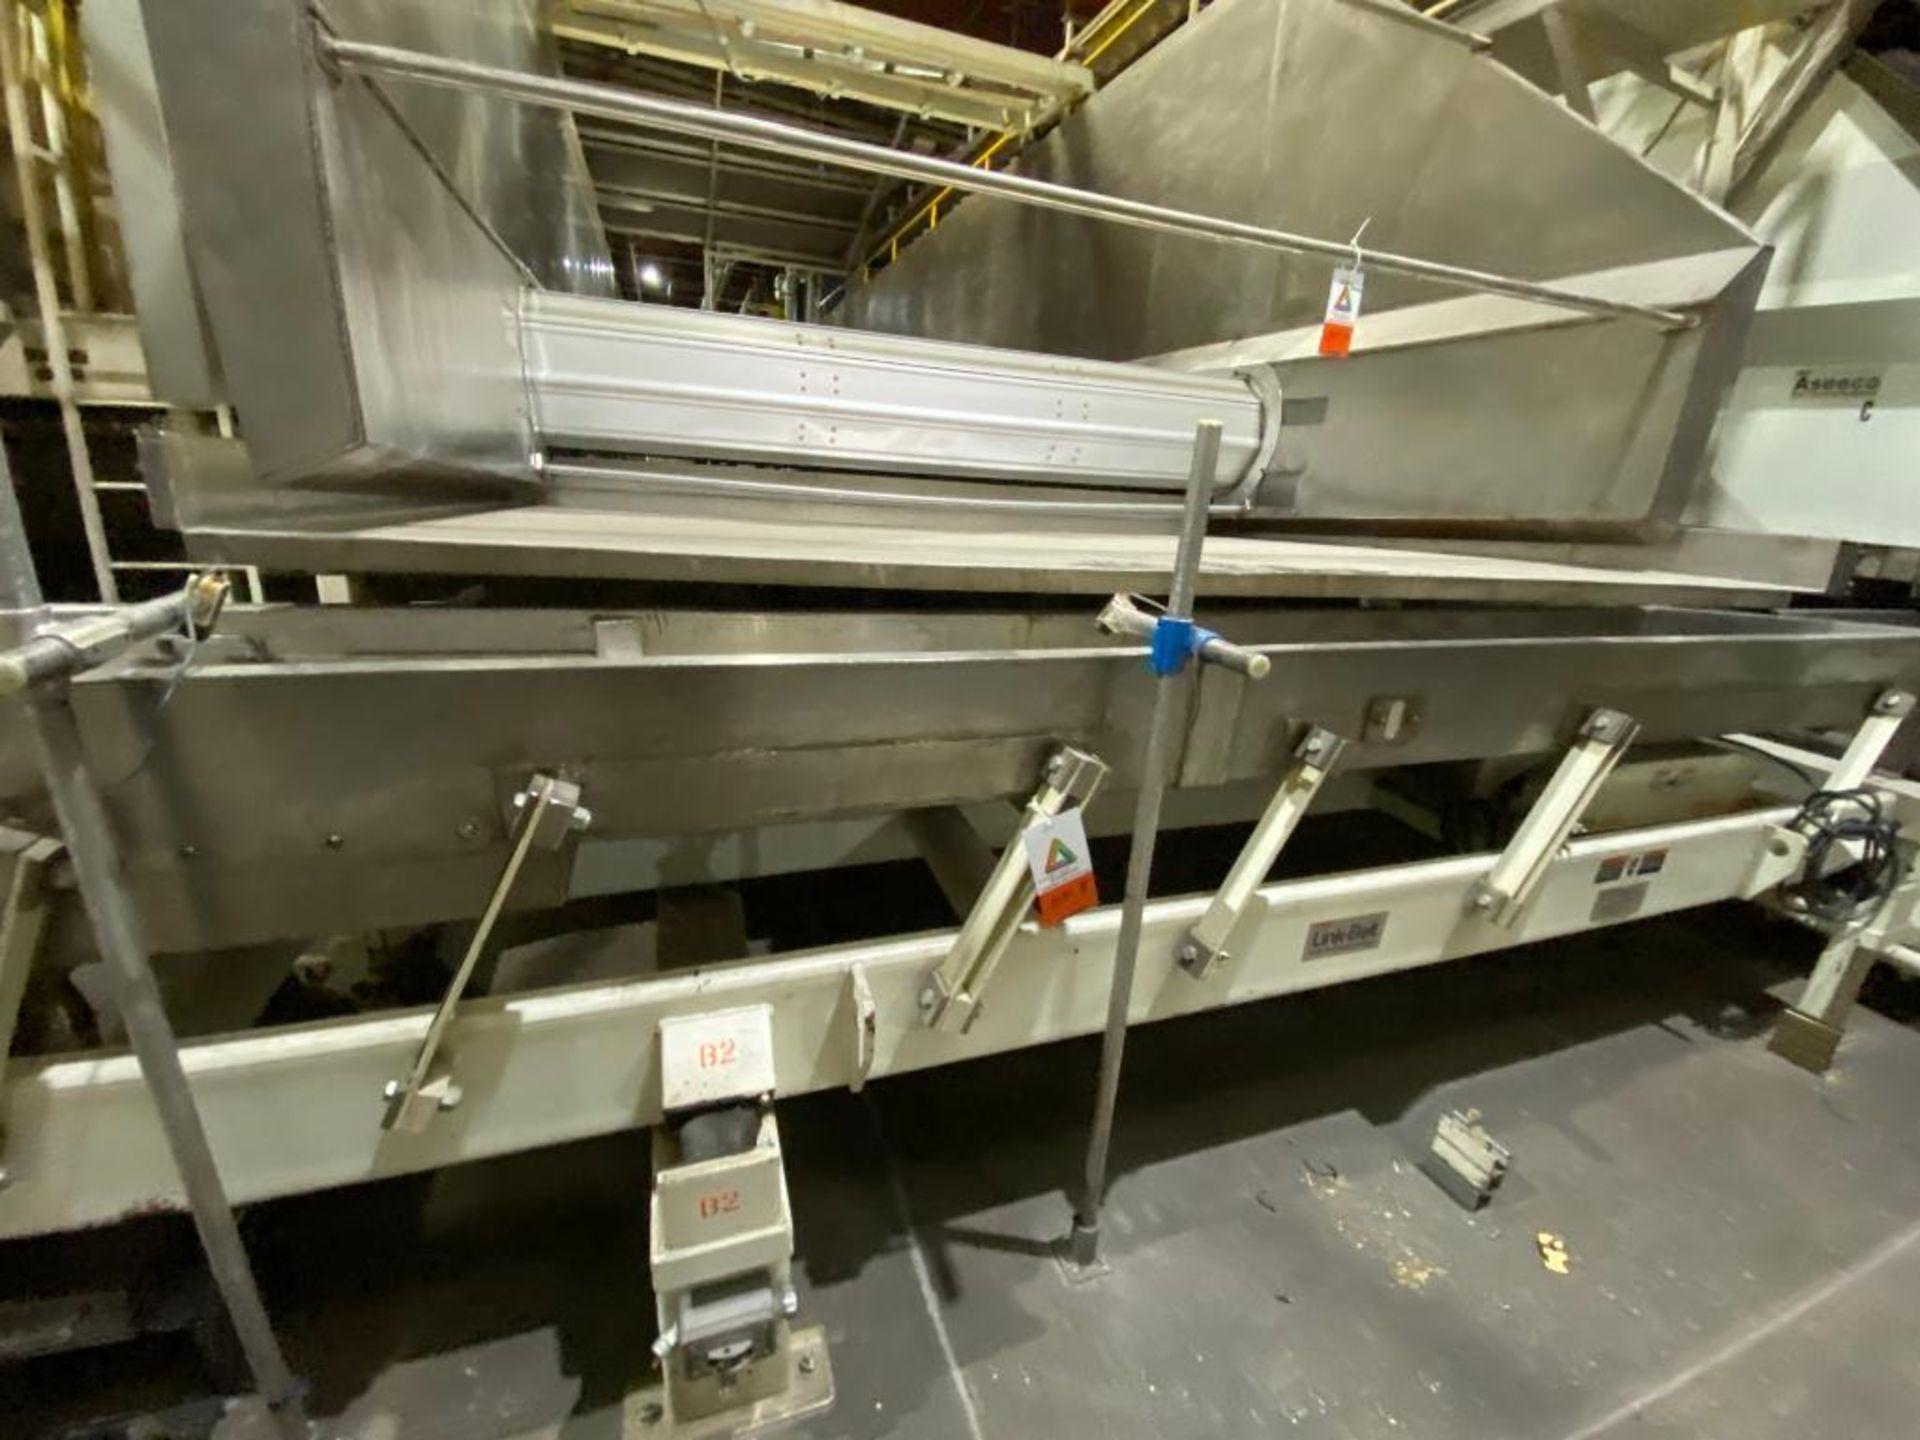 Link Belt vibratory conveyor - Image 2 of 4